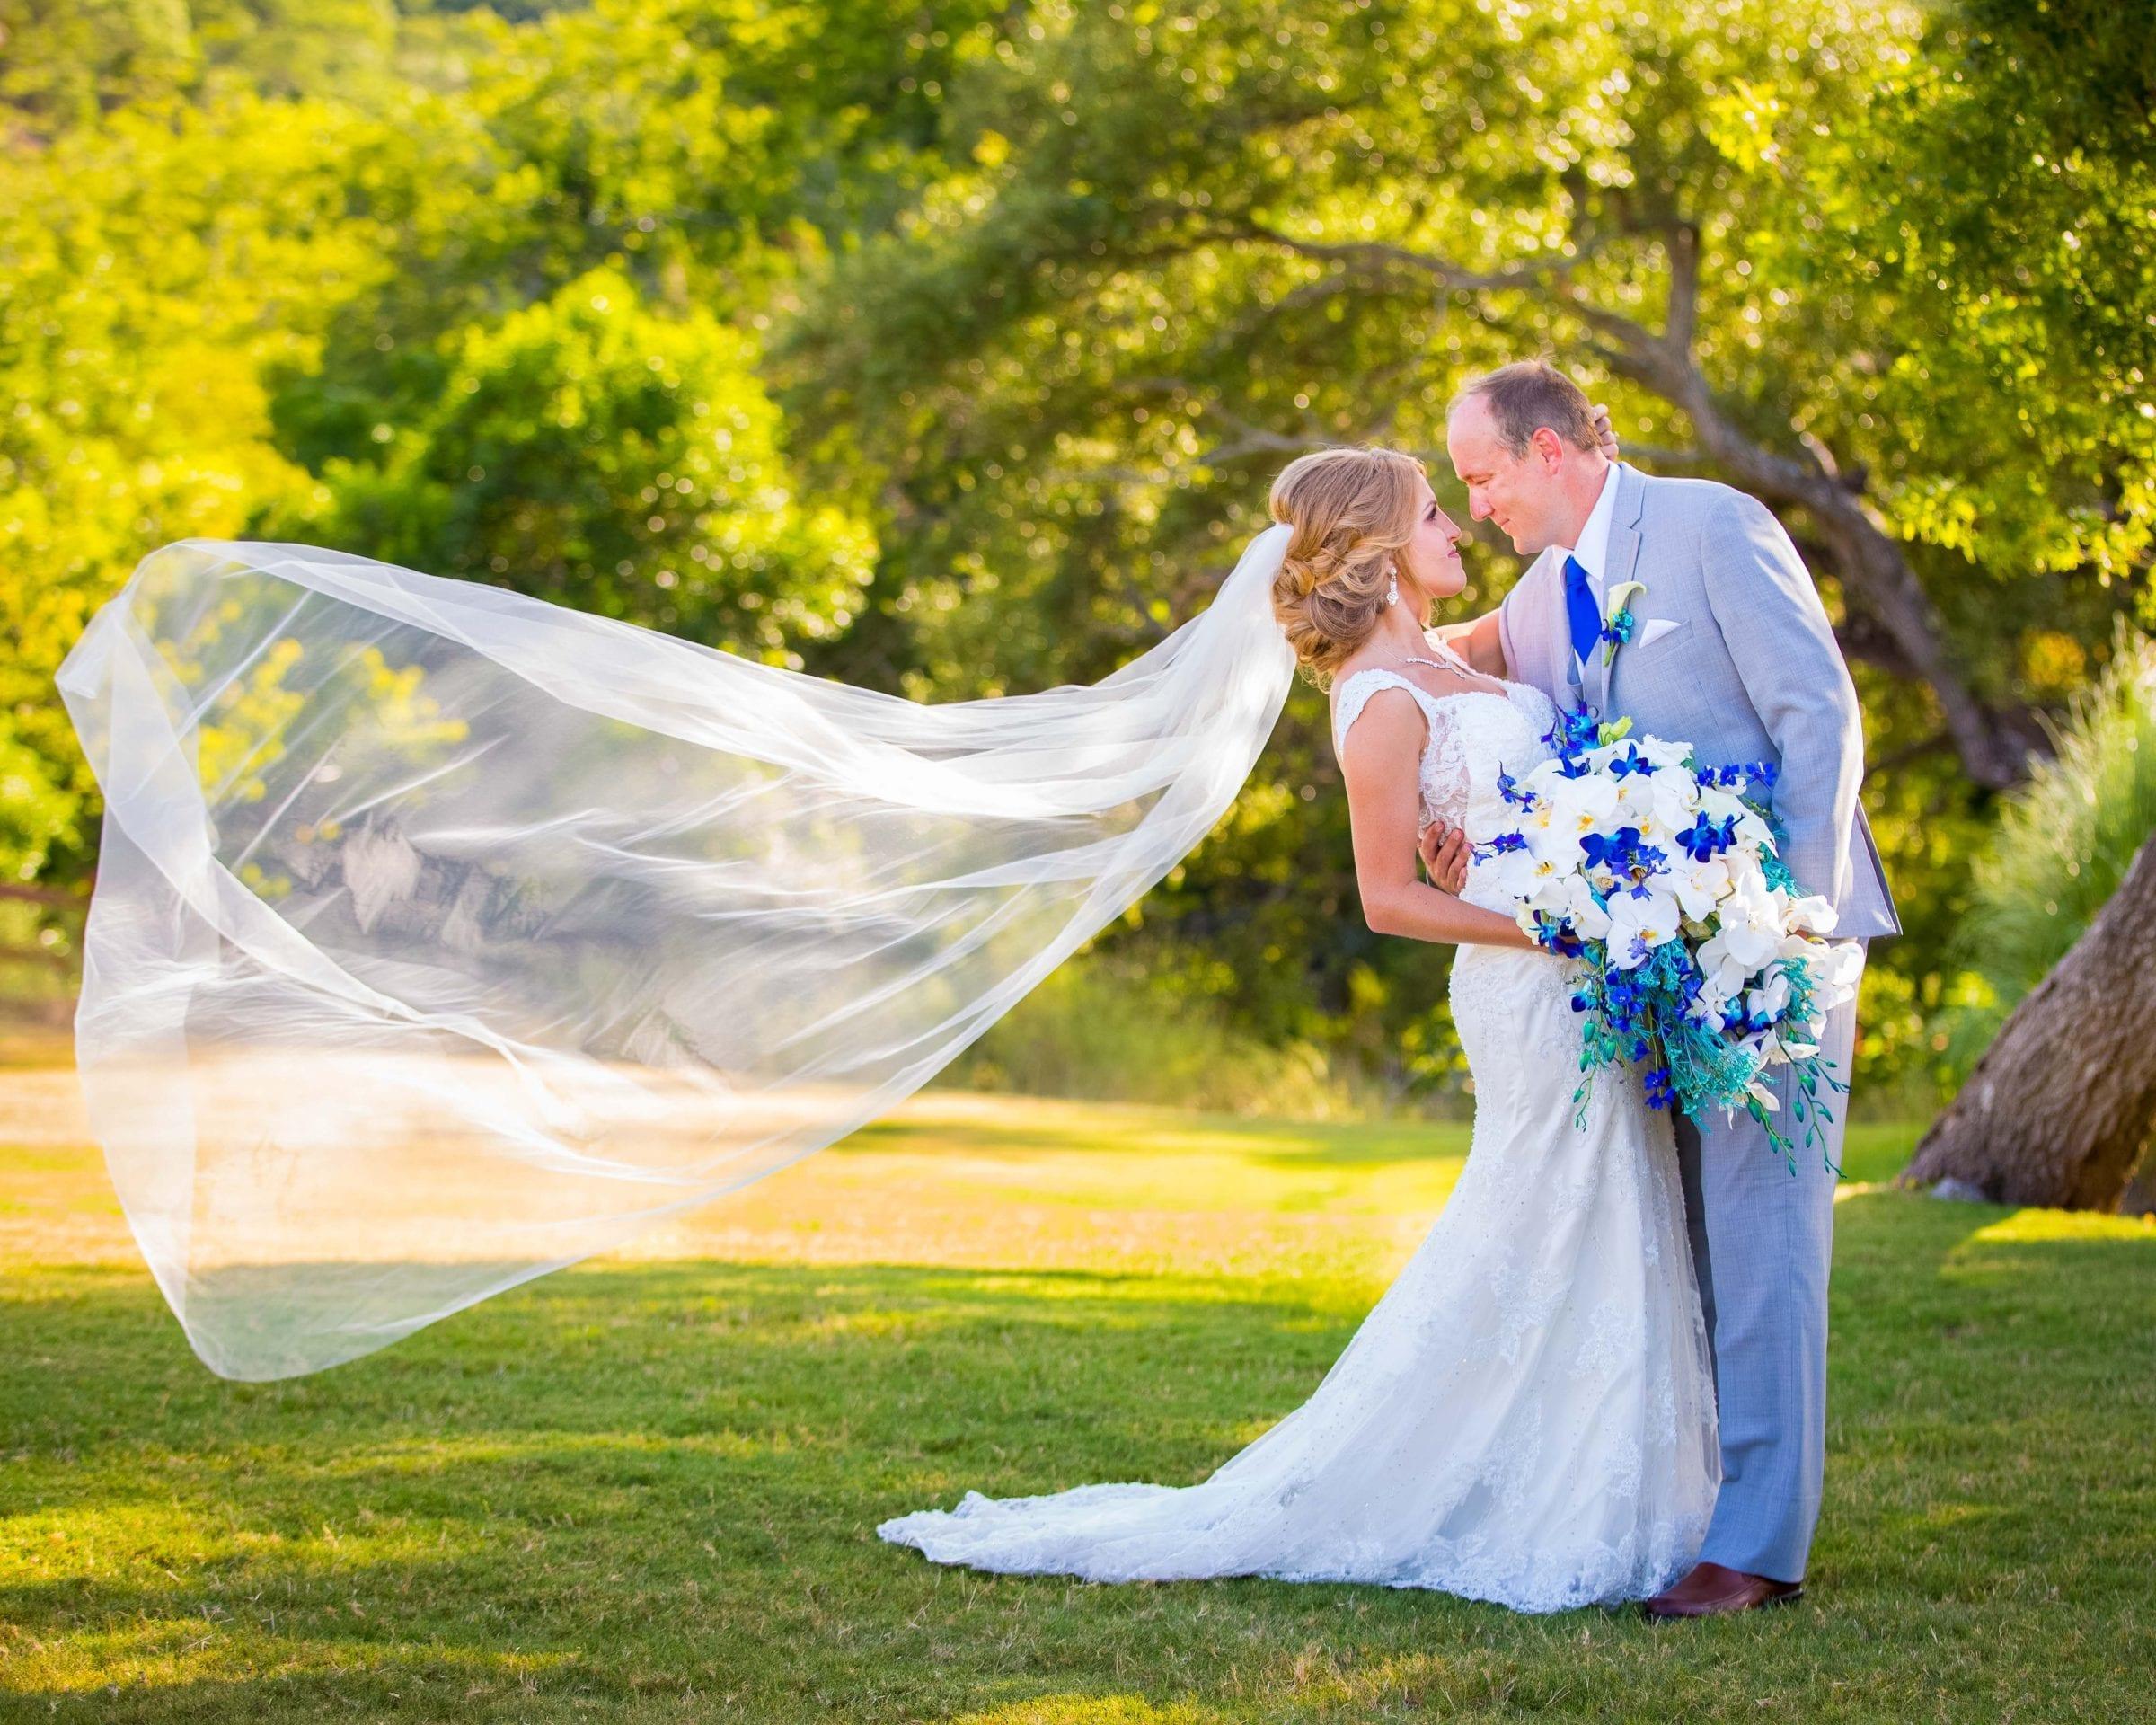 Karissa's wedding at the Milestone Boerne